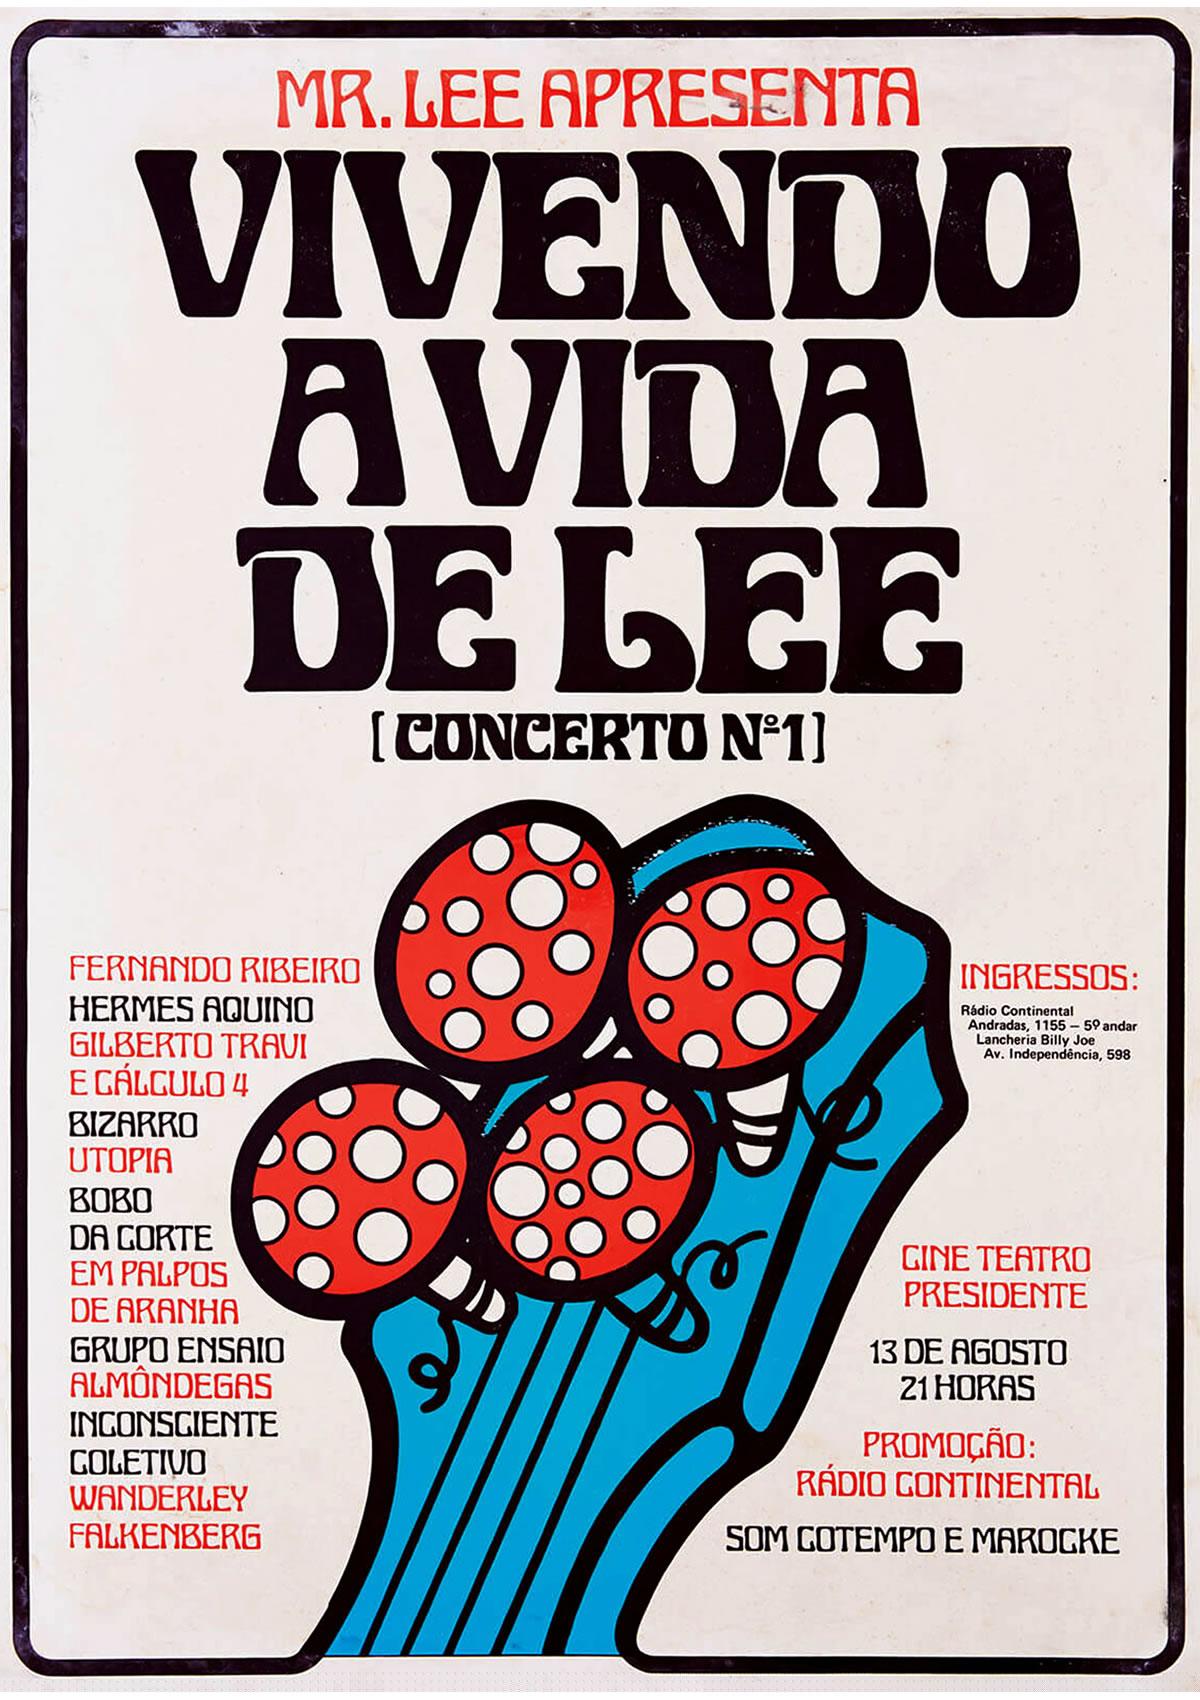 [ACERVO] Poster 'Vivendo a Vida Lee Concerto nª 1', 1975